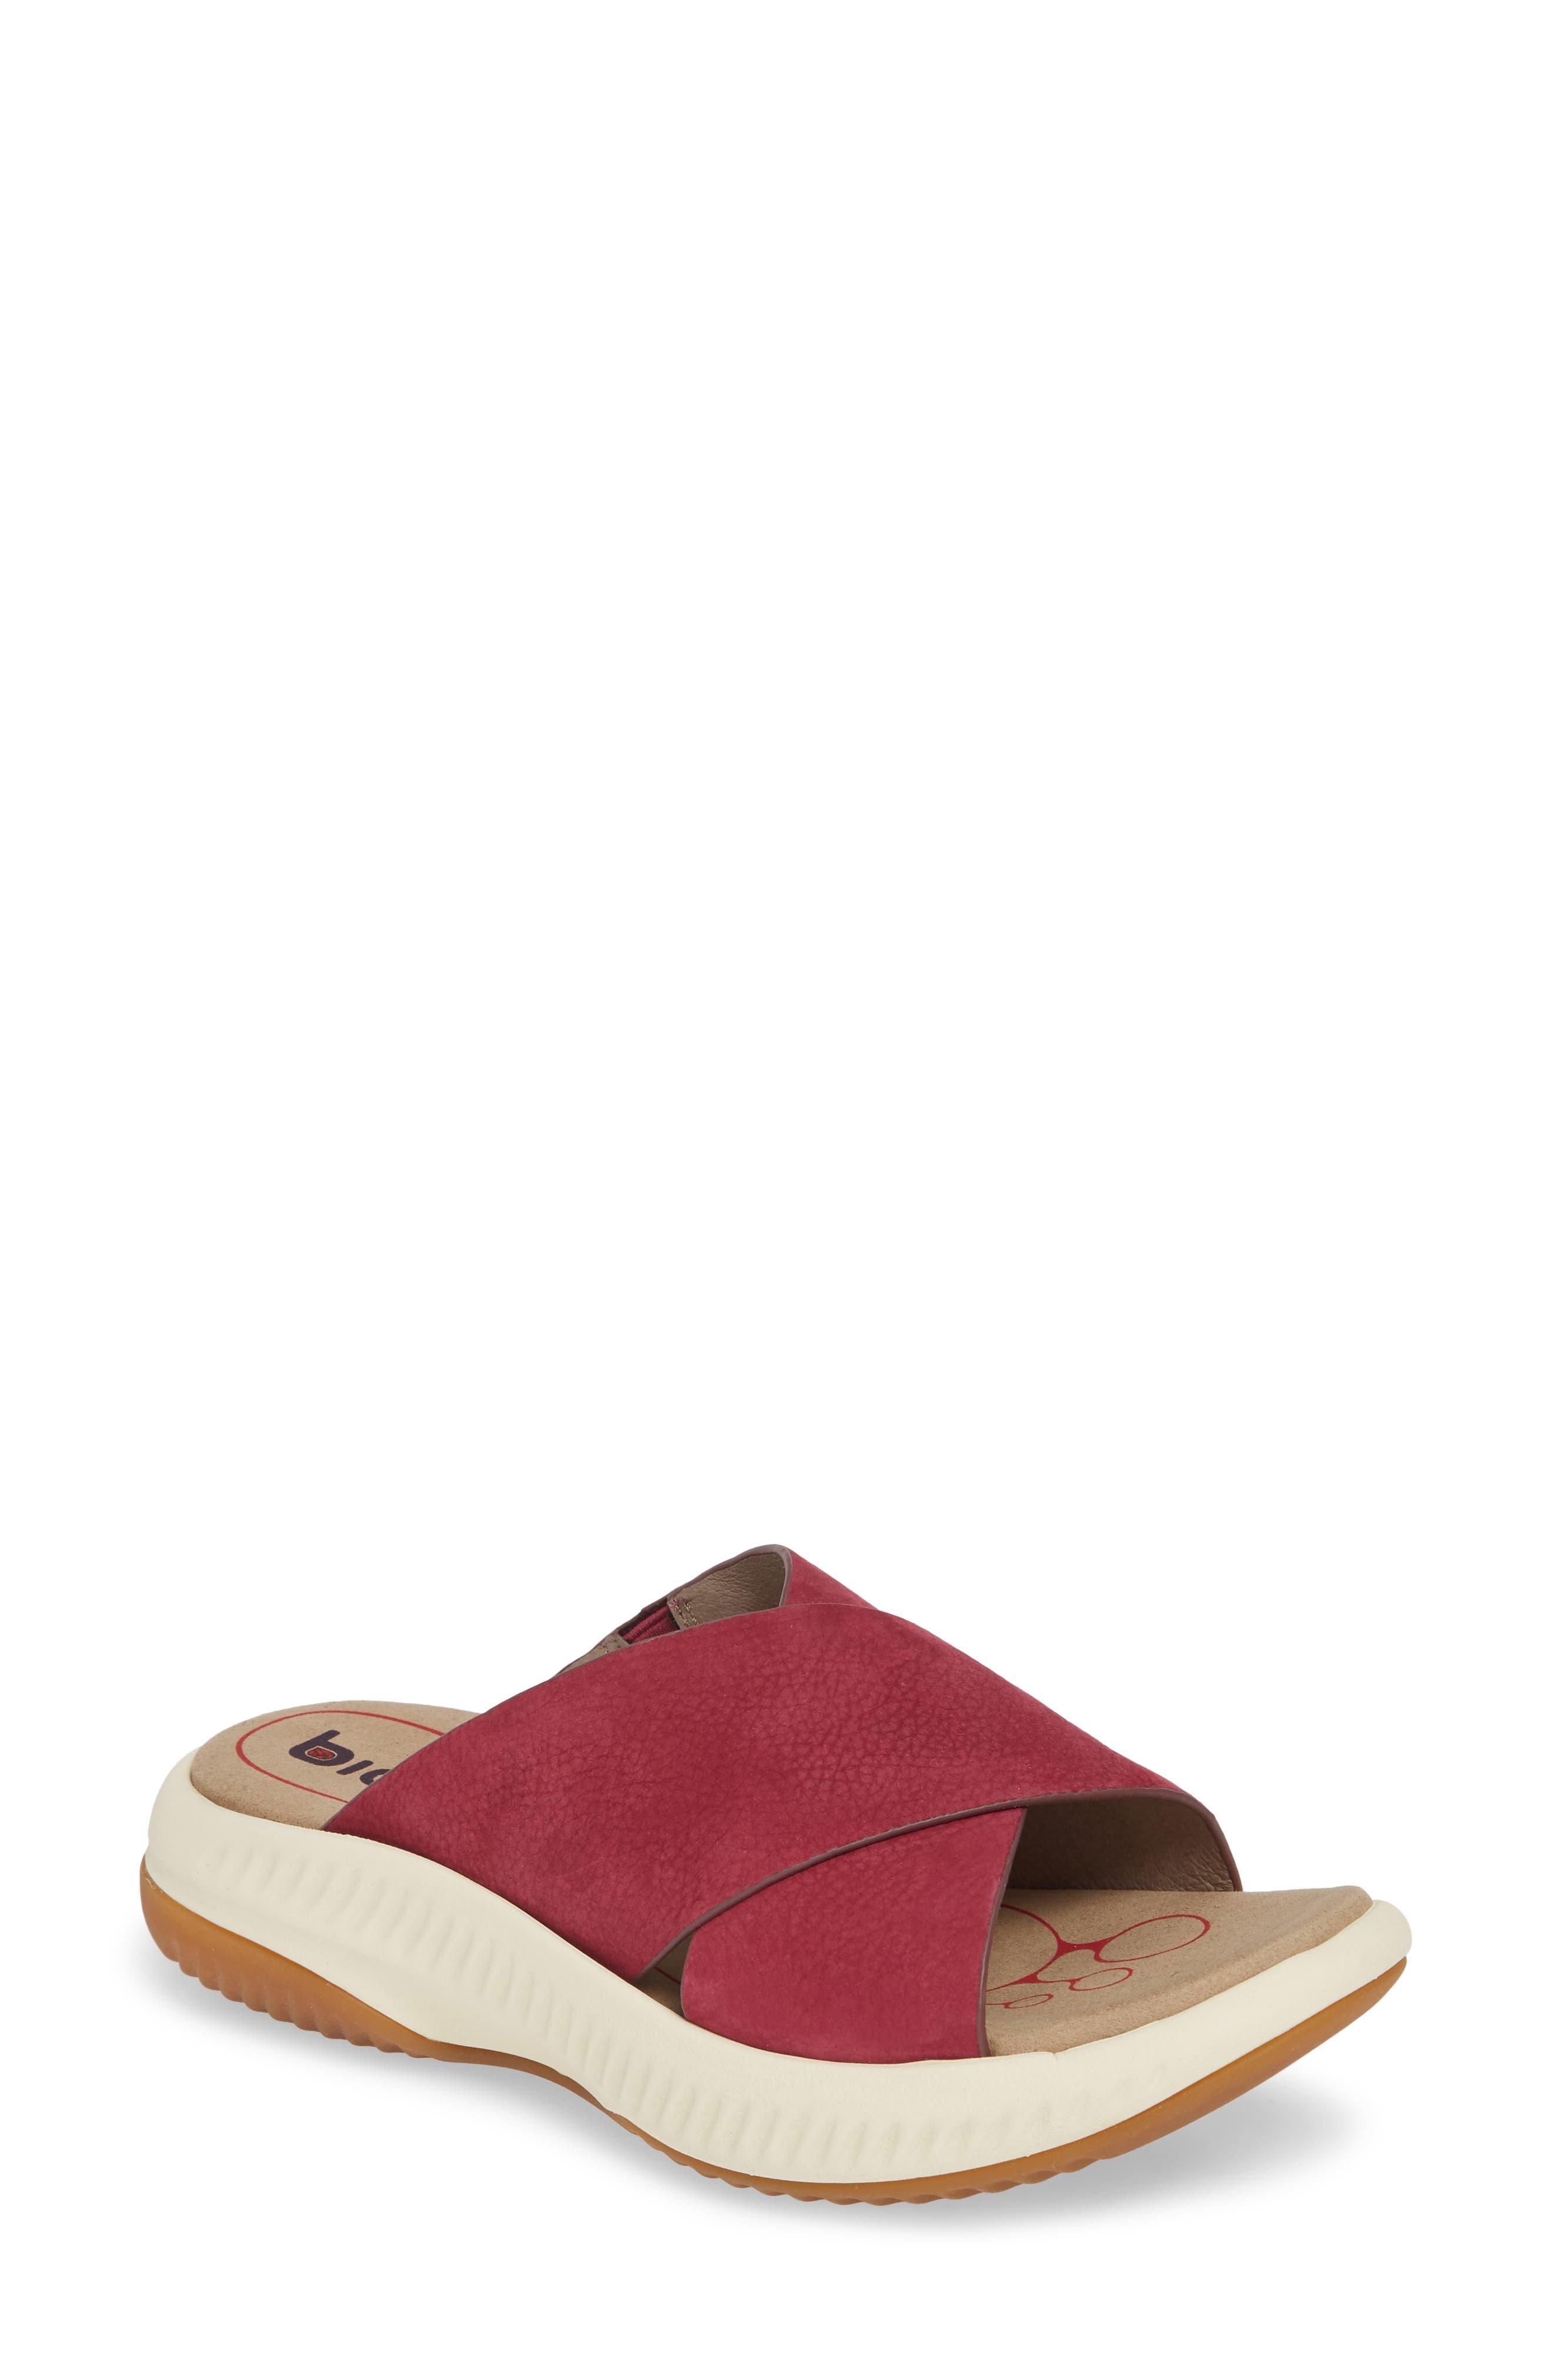 Bionica Ambridge Slide Sandal- Pink